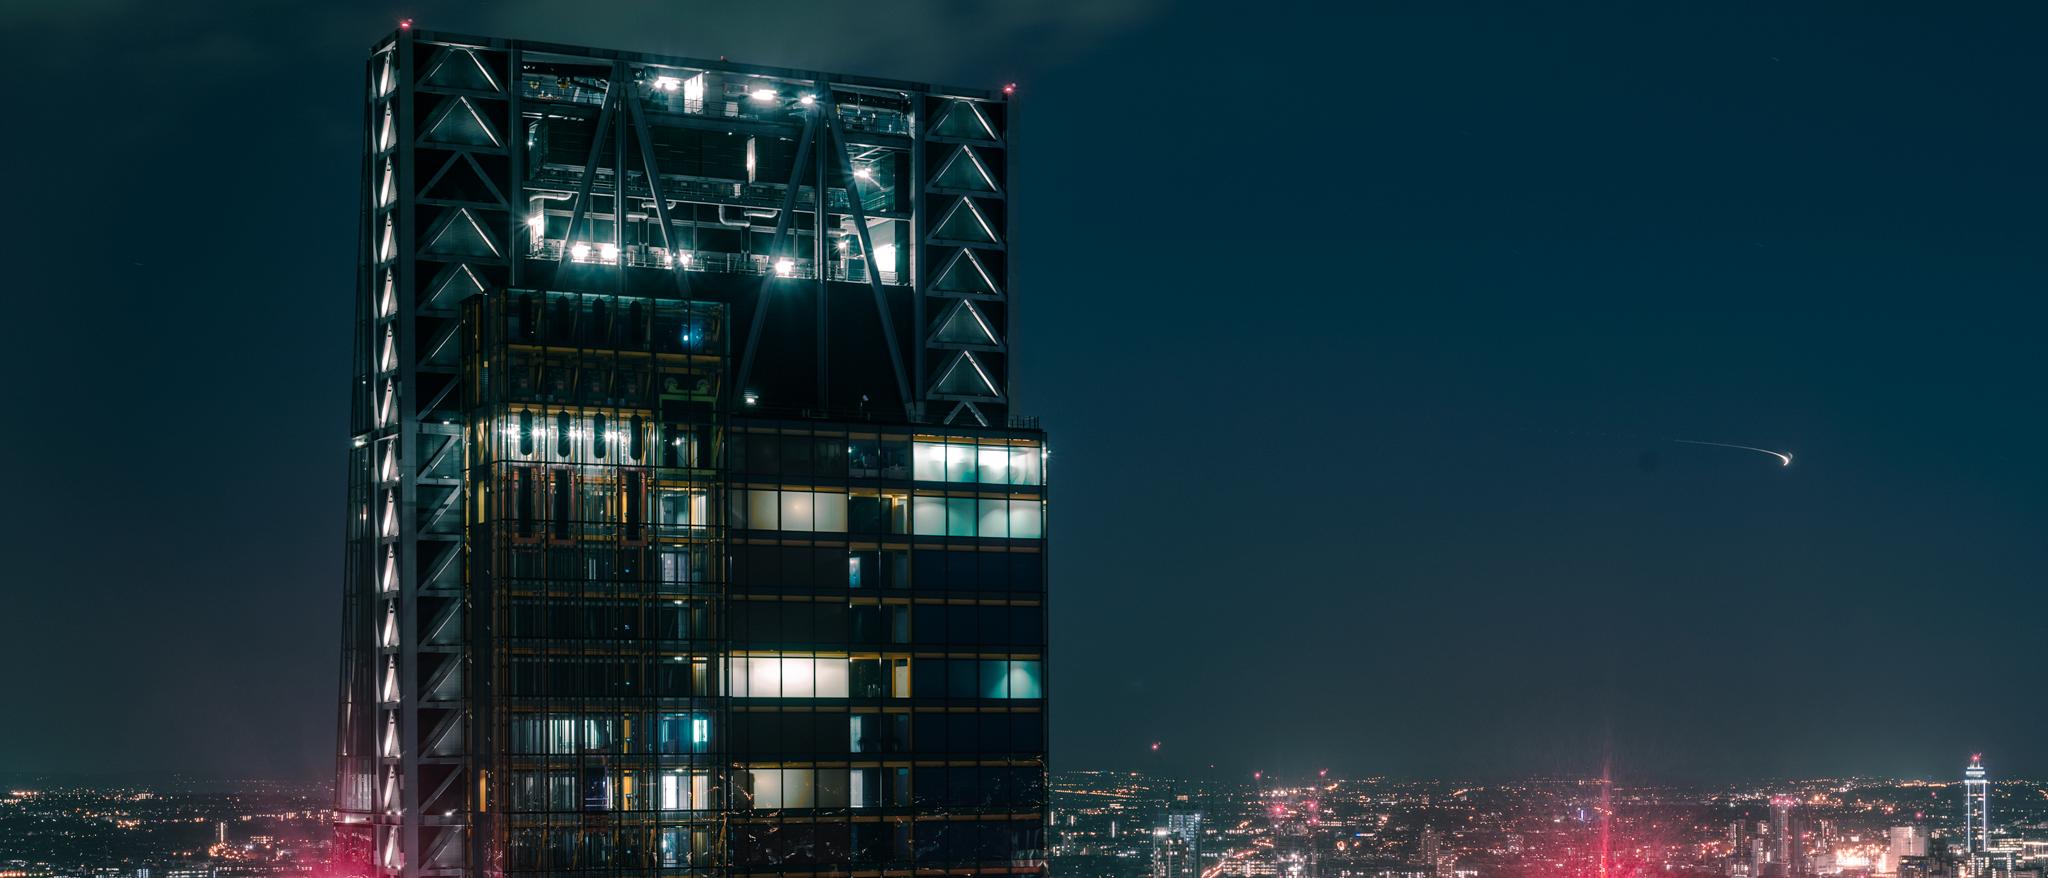 City of London - Leandenhall Building